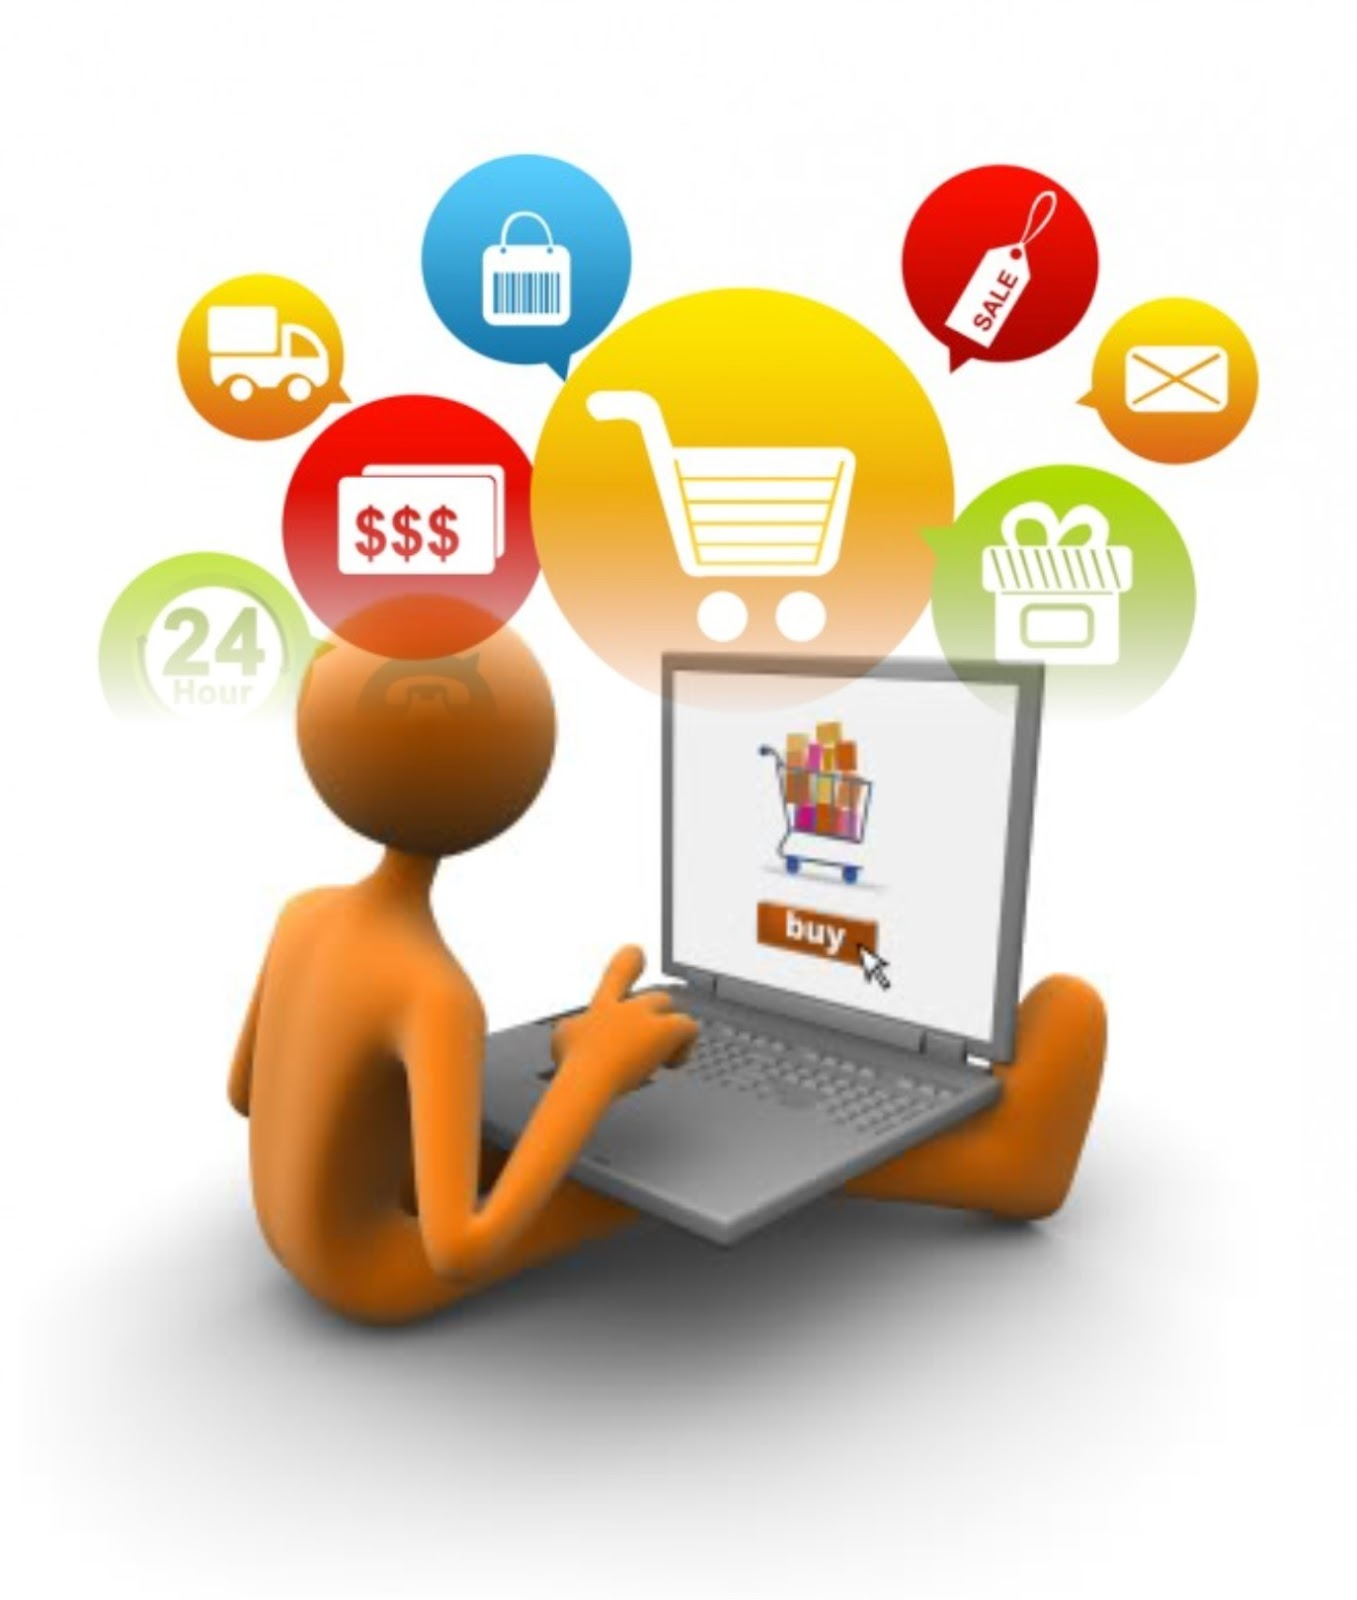 Website Tempat Jual Beli Online terbesar dan paling terkenal di ... 86795e33a6